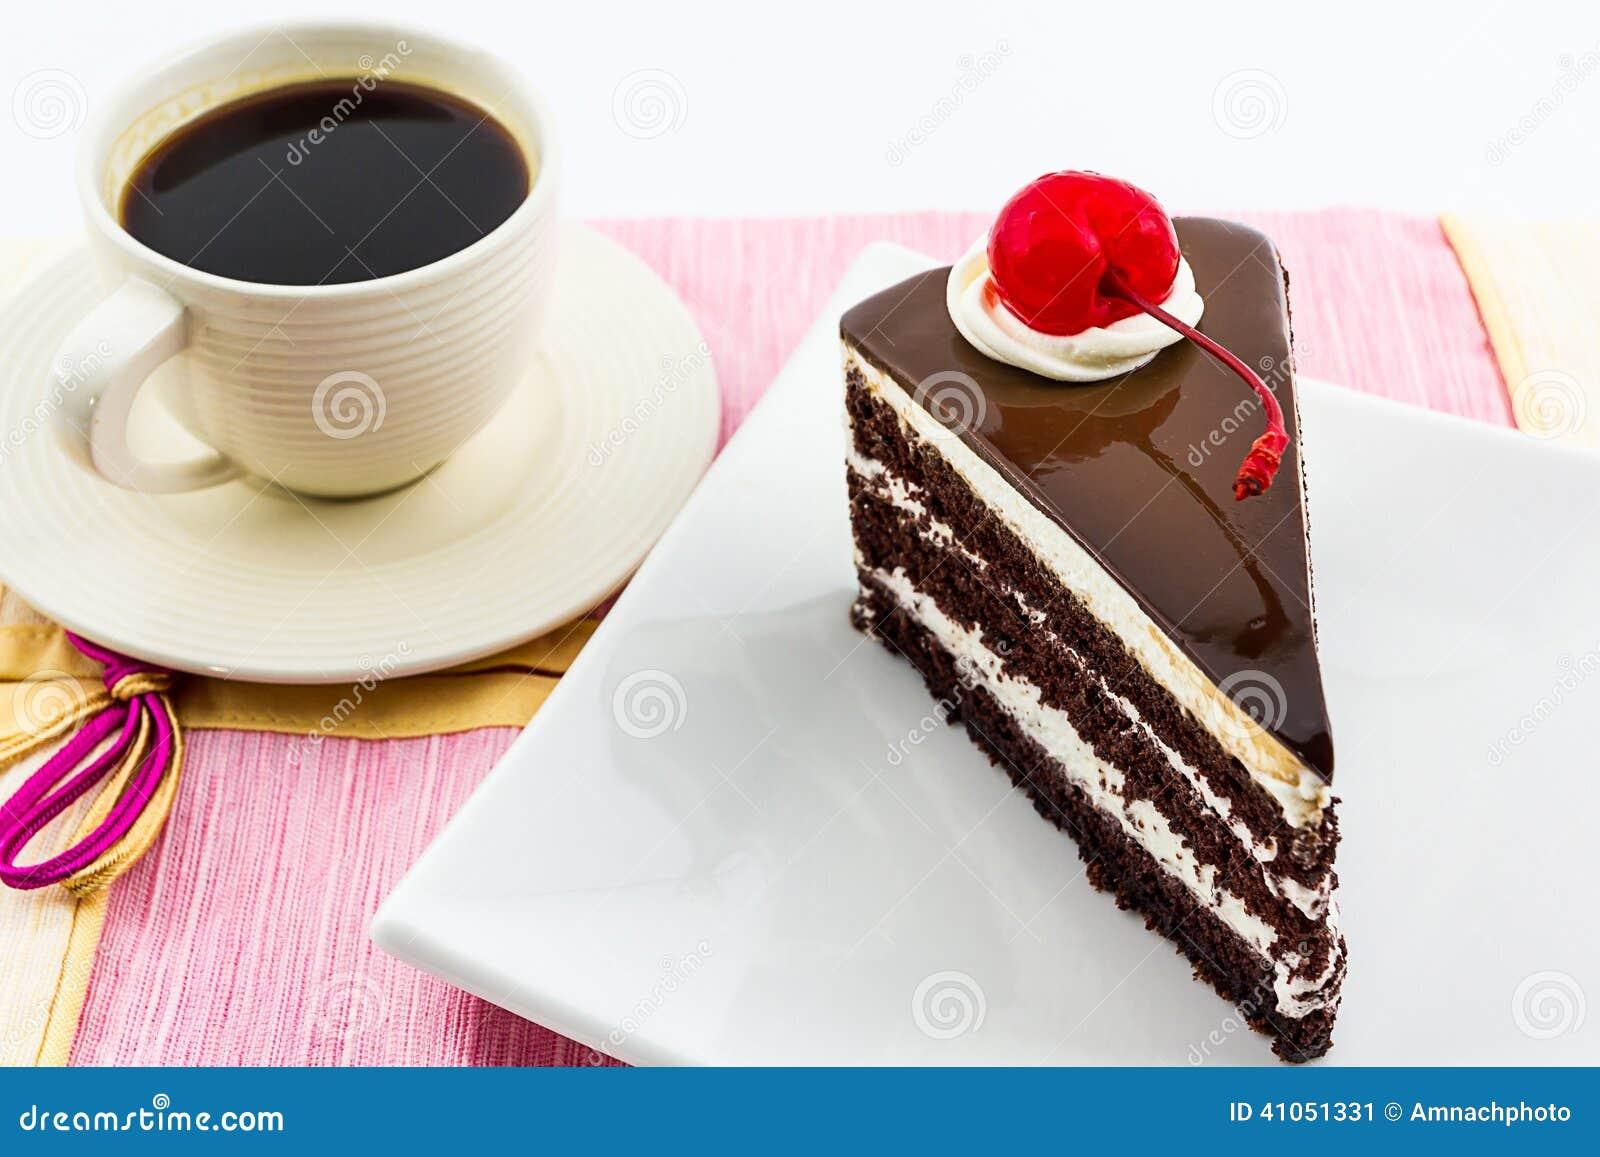 A piece of cake cupcake brown